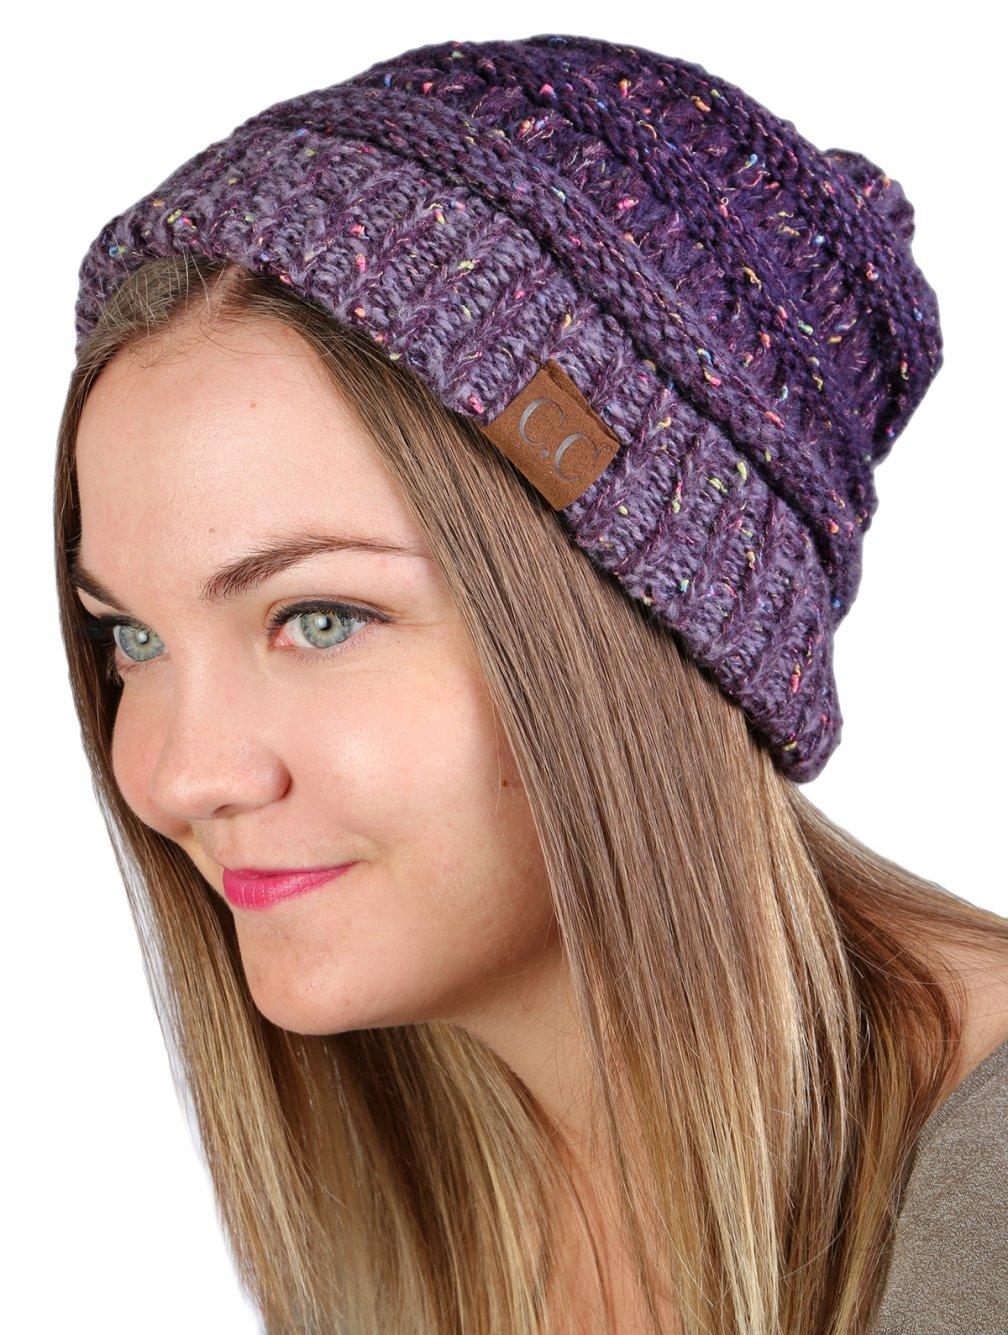 Funky Junque CC Confetti Knit Beanie - Thick Soft Warm Winter Hat - Unisex  1 Dove Grey ... eea729fa7b80